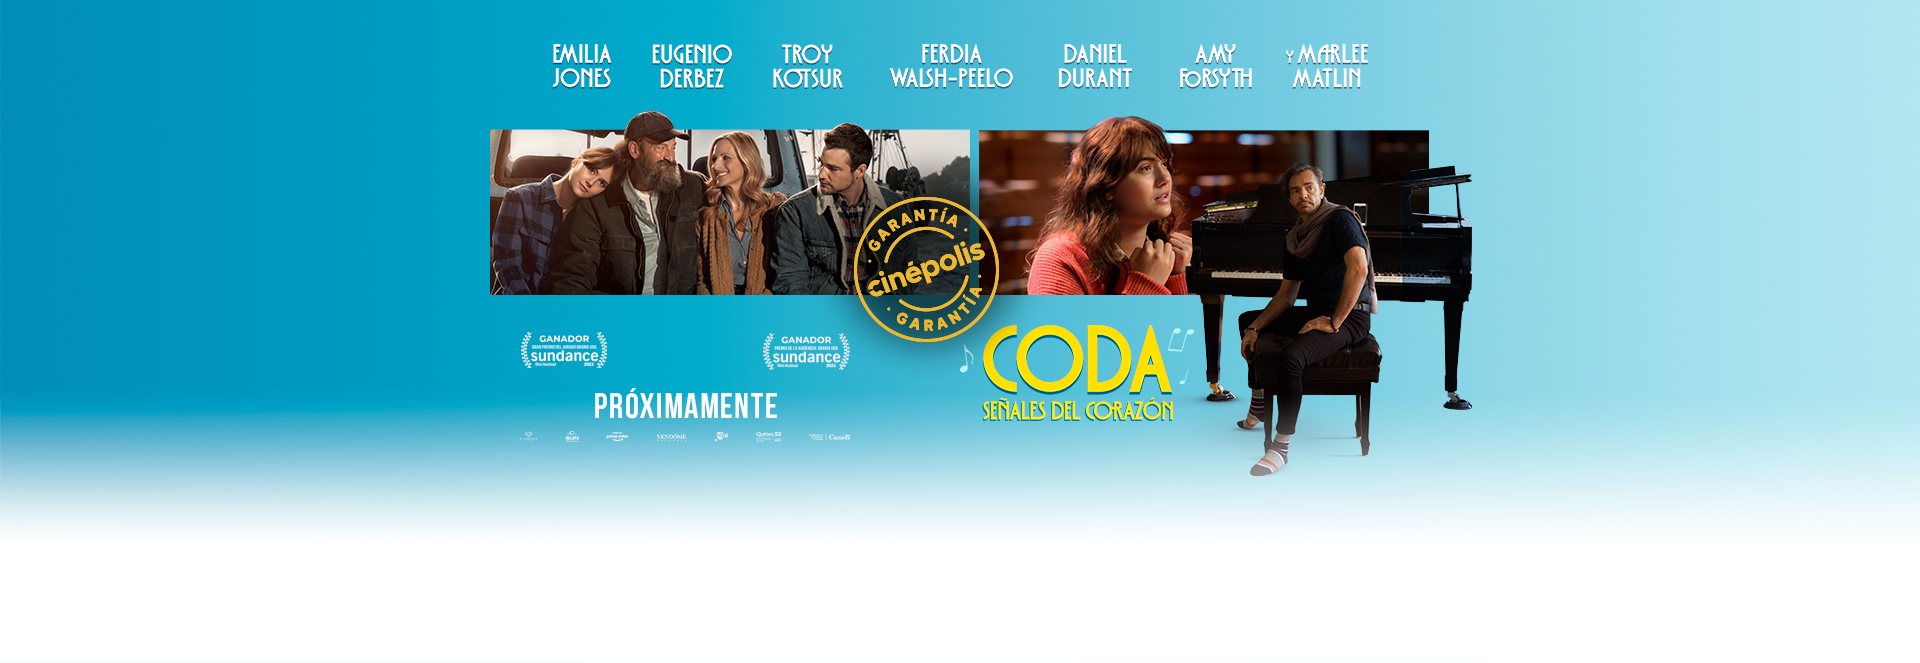 Banner Coda: Señales del Corazón | Garantía Cinépolis